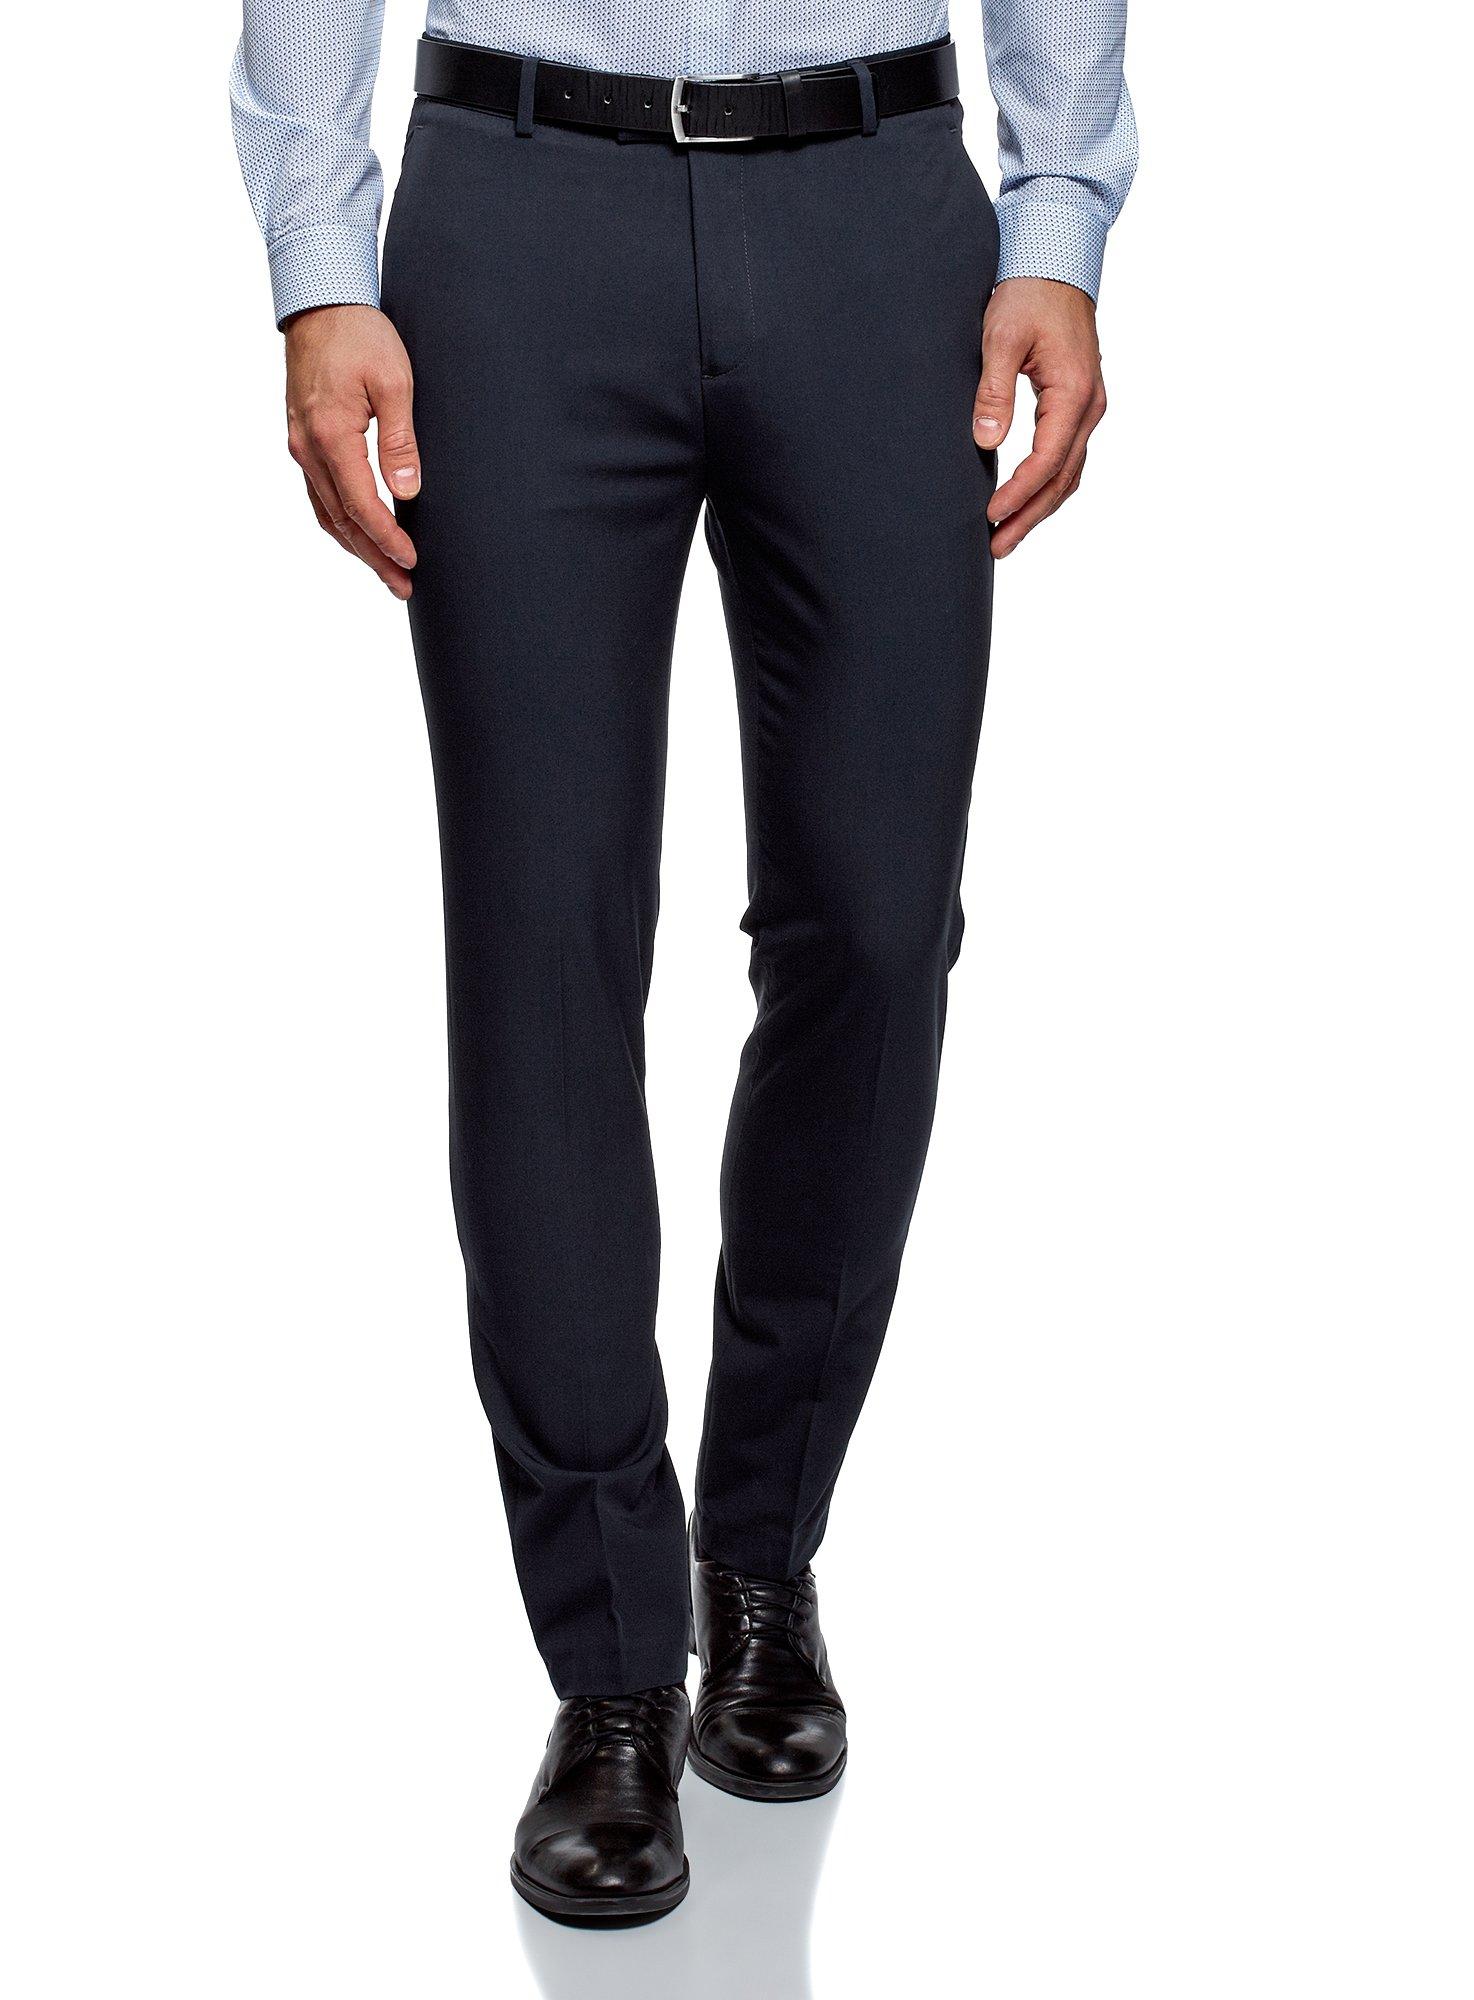 oodji Ultra Men's Lightweight Slim-Fit Trousers, Blue, US 33 / EU 44 / L